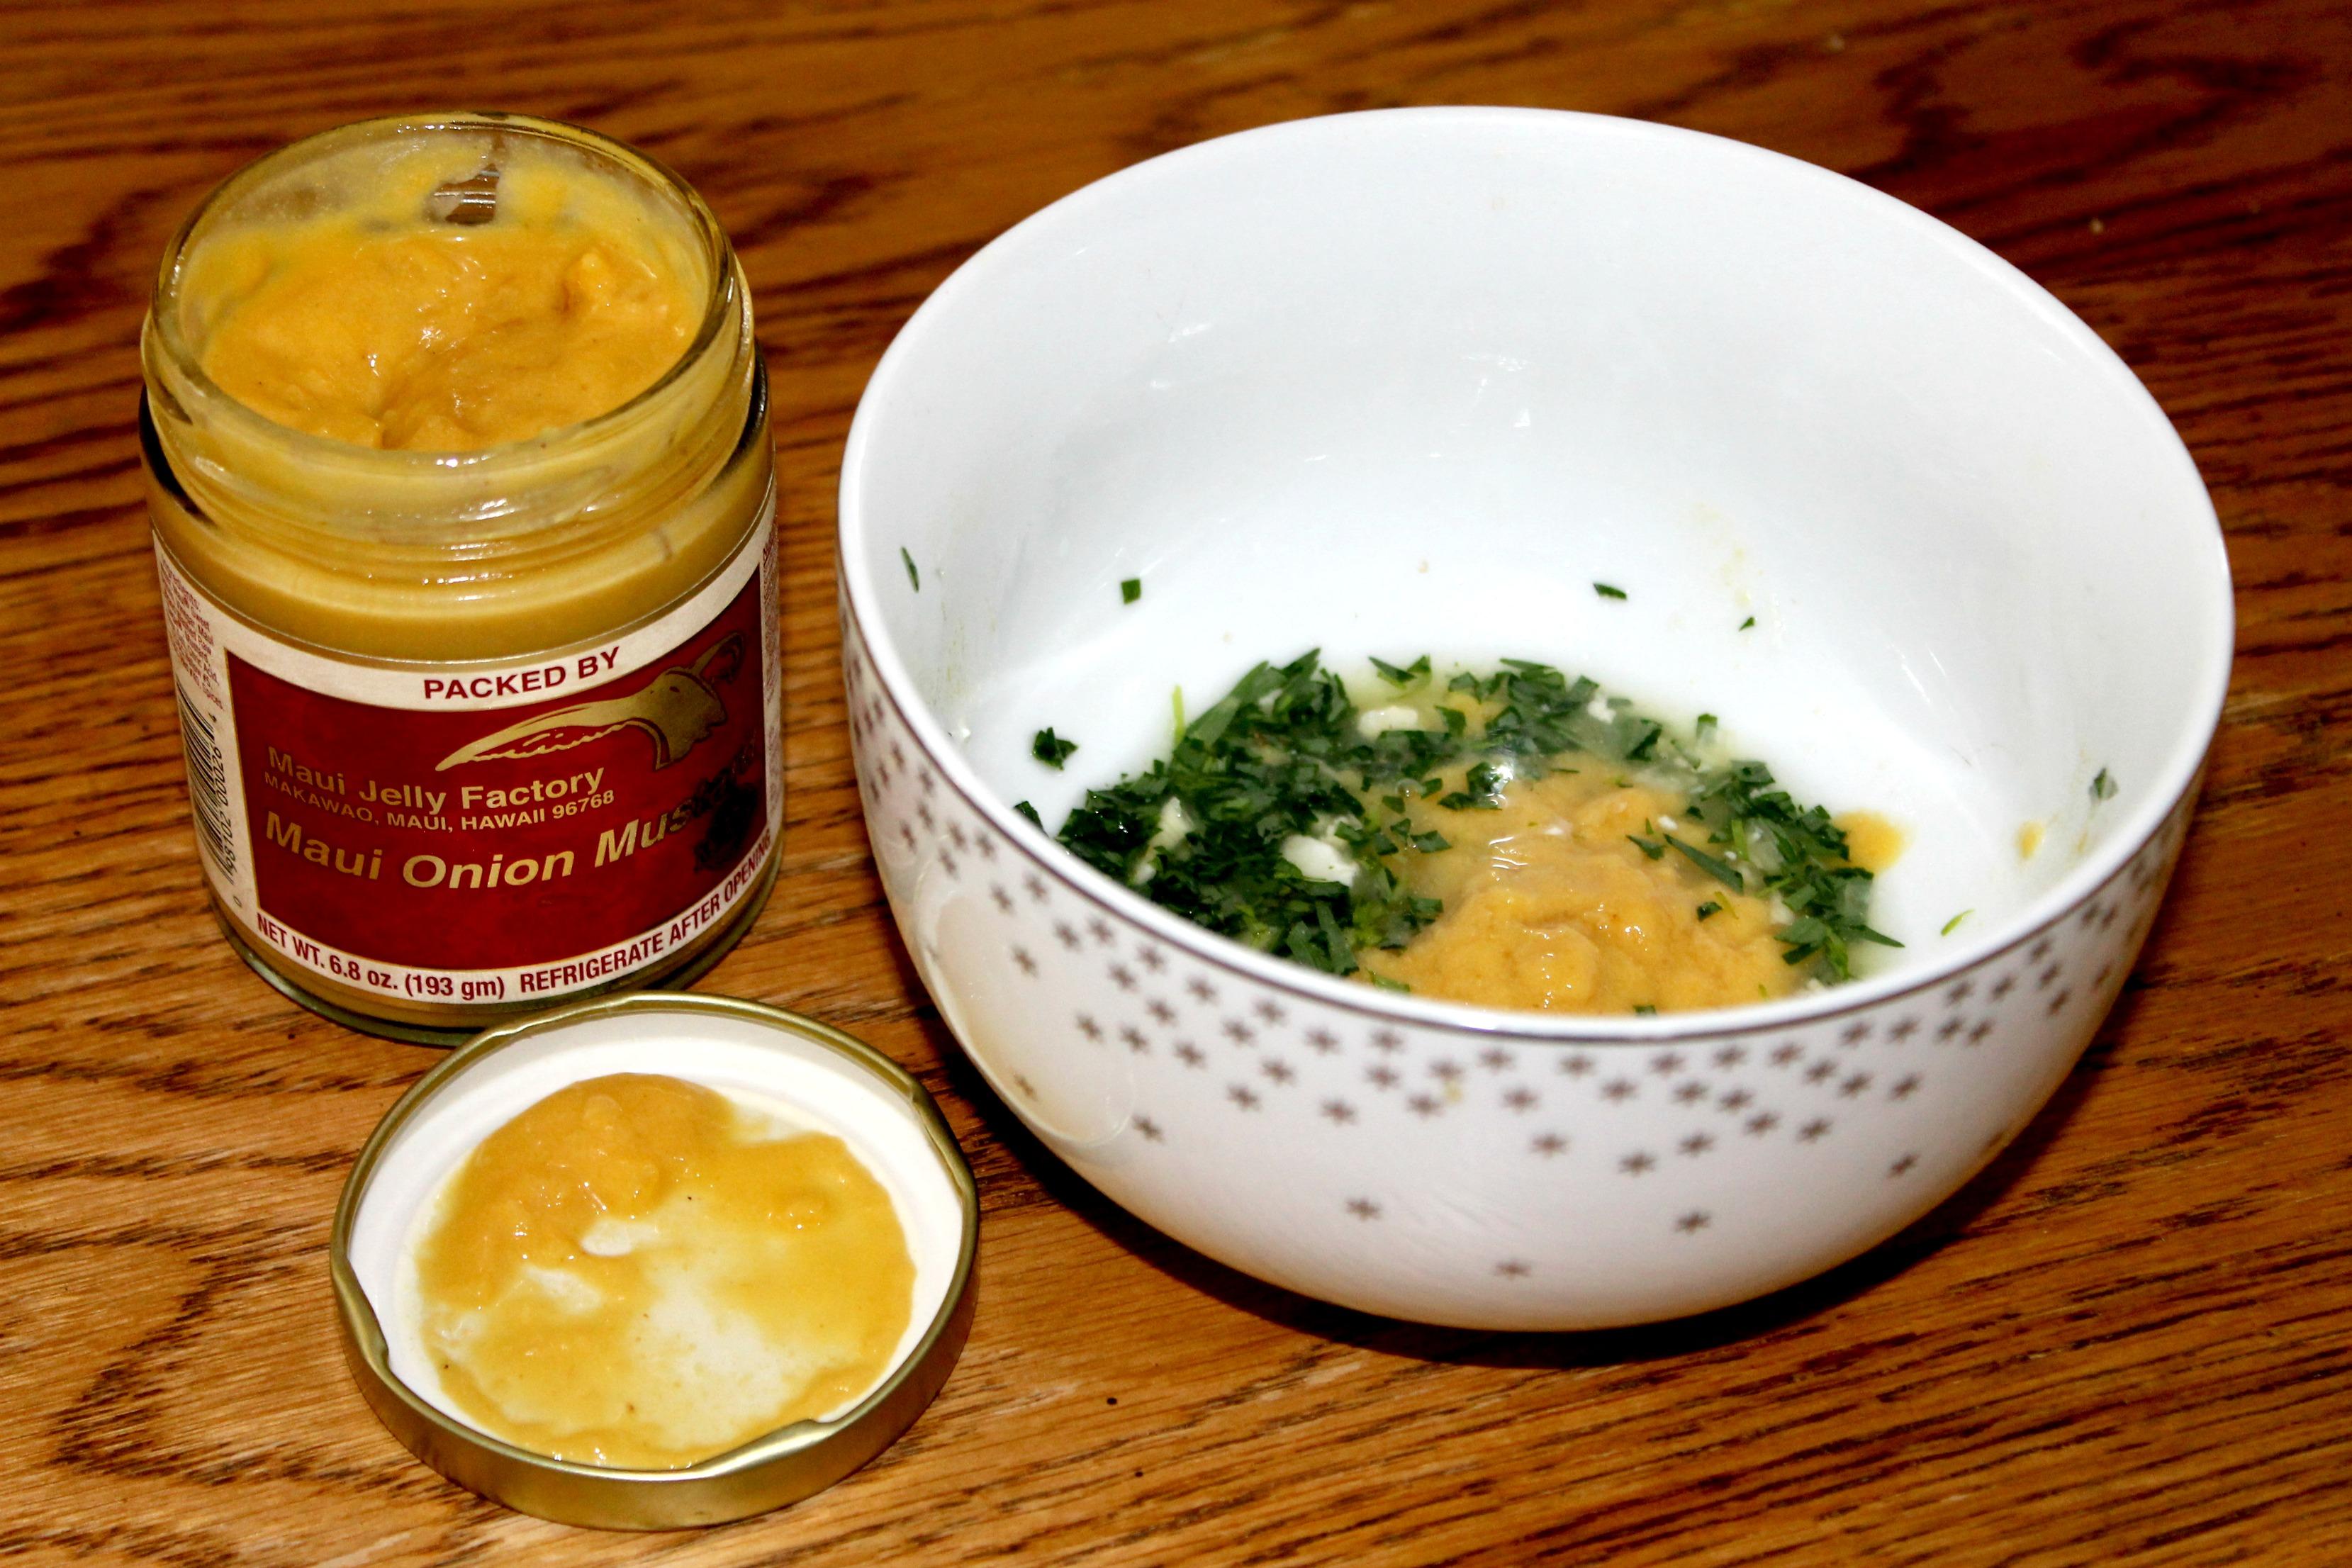 Blue apron niman ranch - Blue Apron Meals Mustard